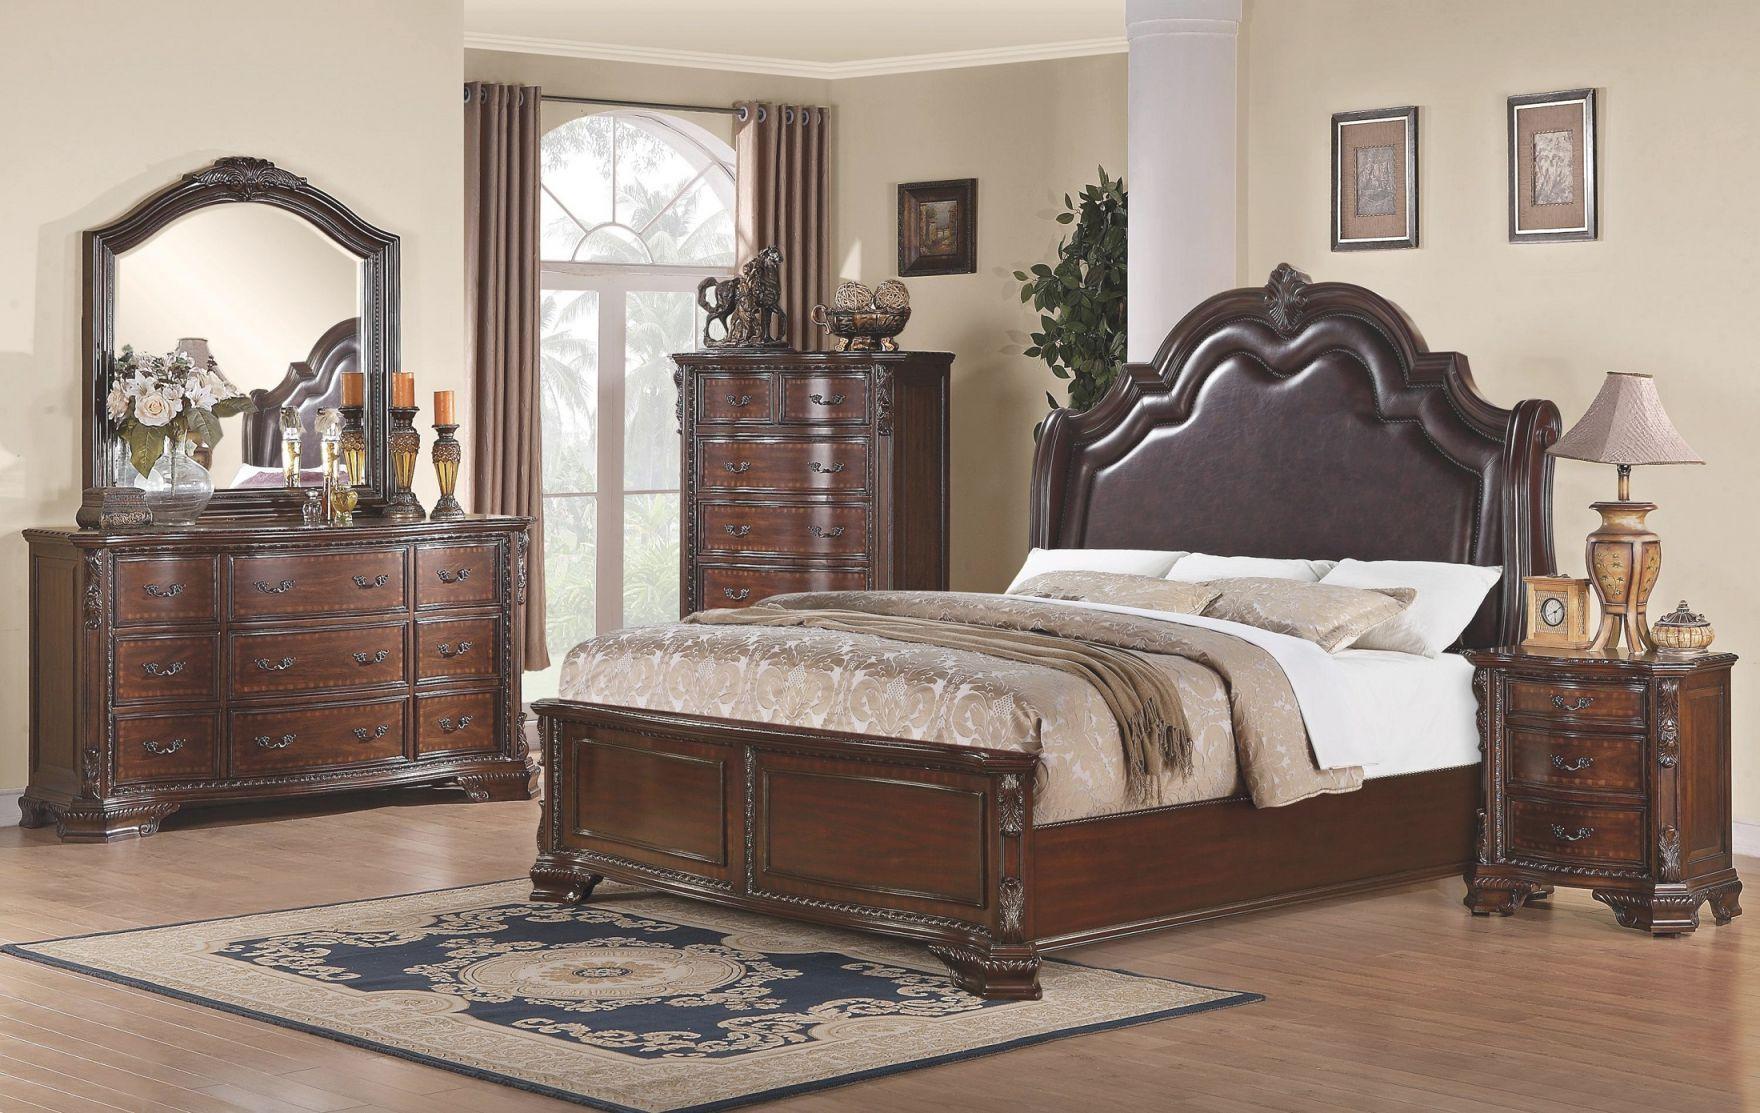 Coaster Furniture Bedroom Sets Ideas — Show Gopher : Should with Bedroom Set Ideas